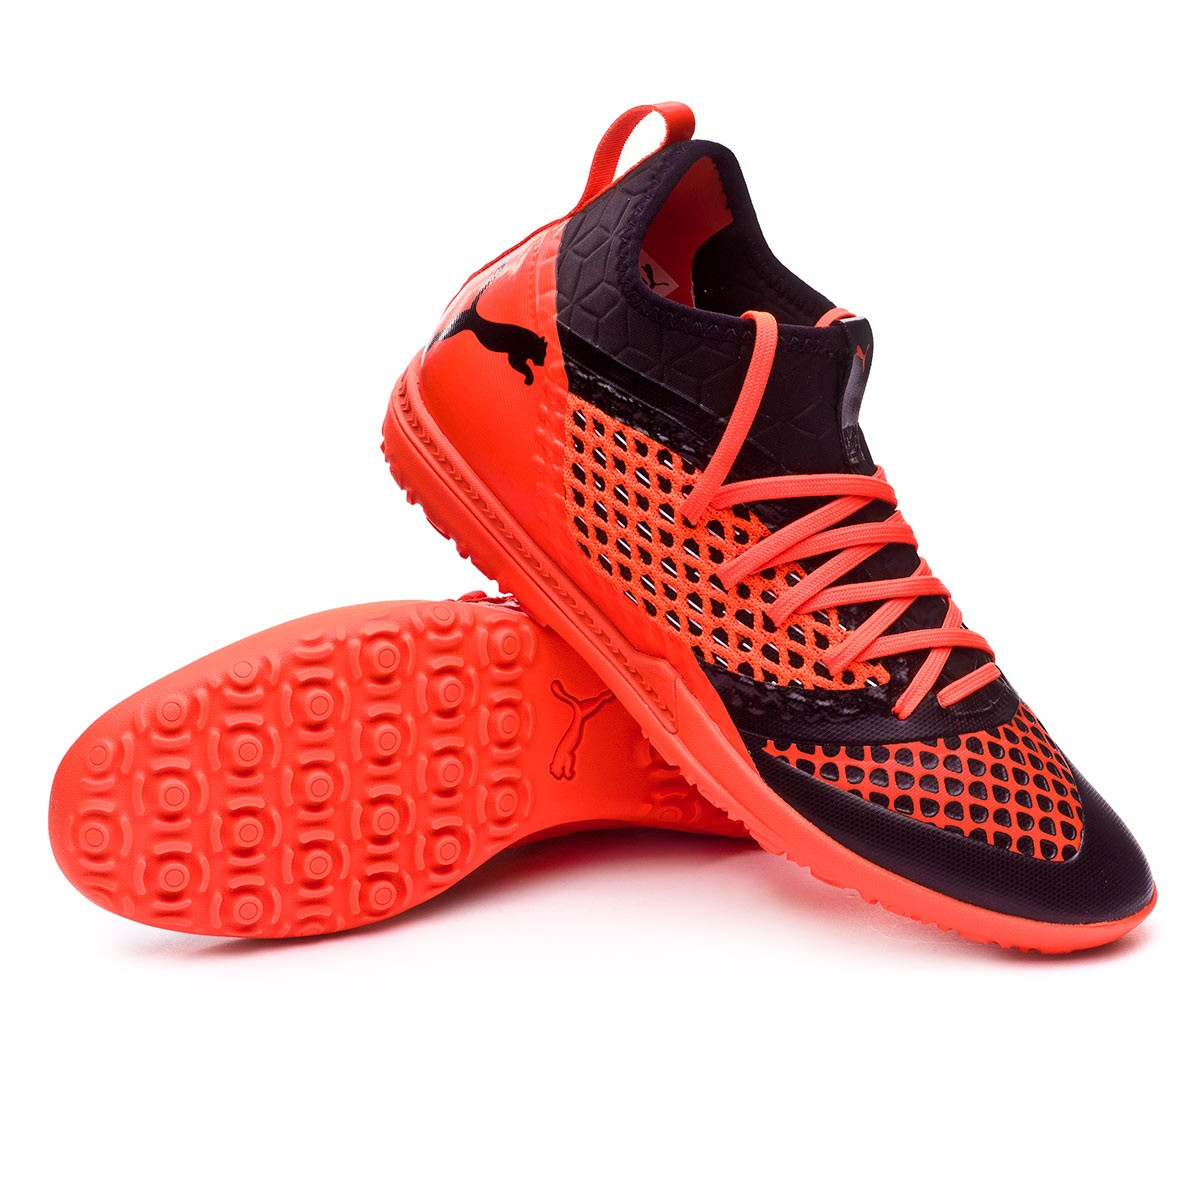 new style 30a21 65fcd Football Boot Puma Future 2.3 Netfit TT Puma black-Shocking orange -  Football store Fútbol Emotion